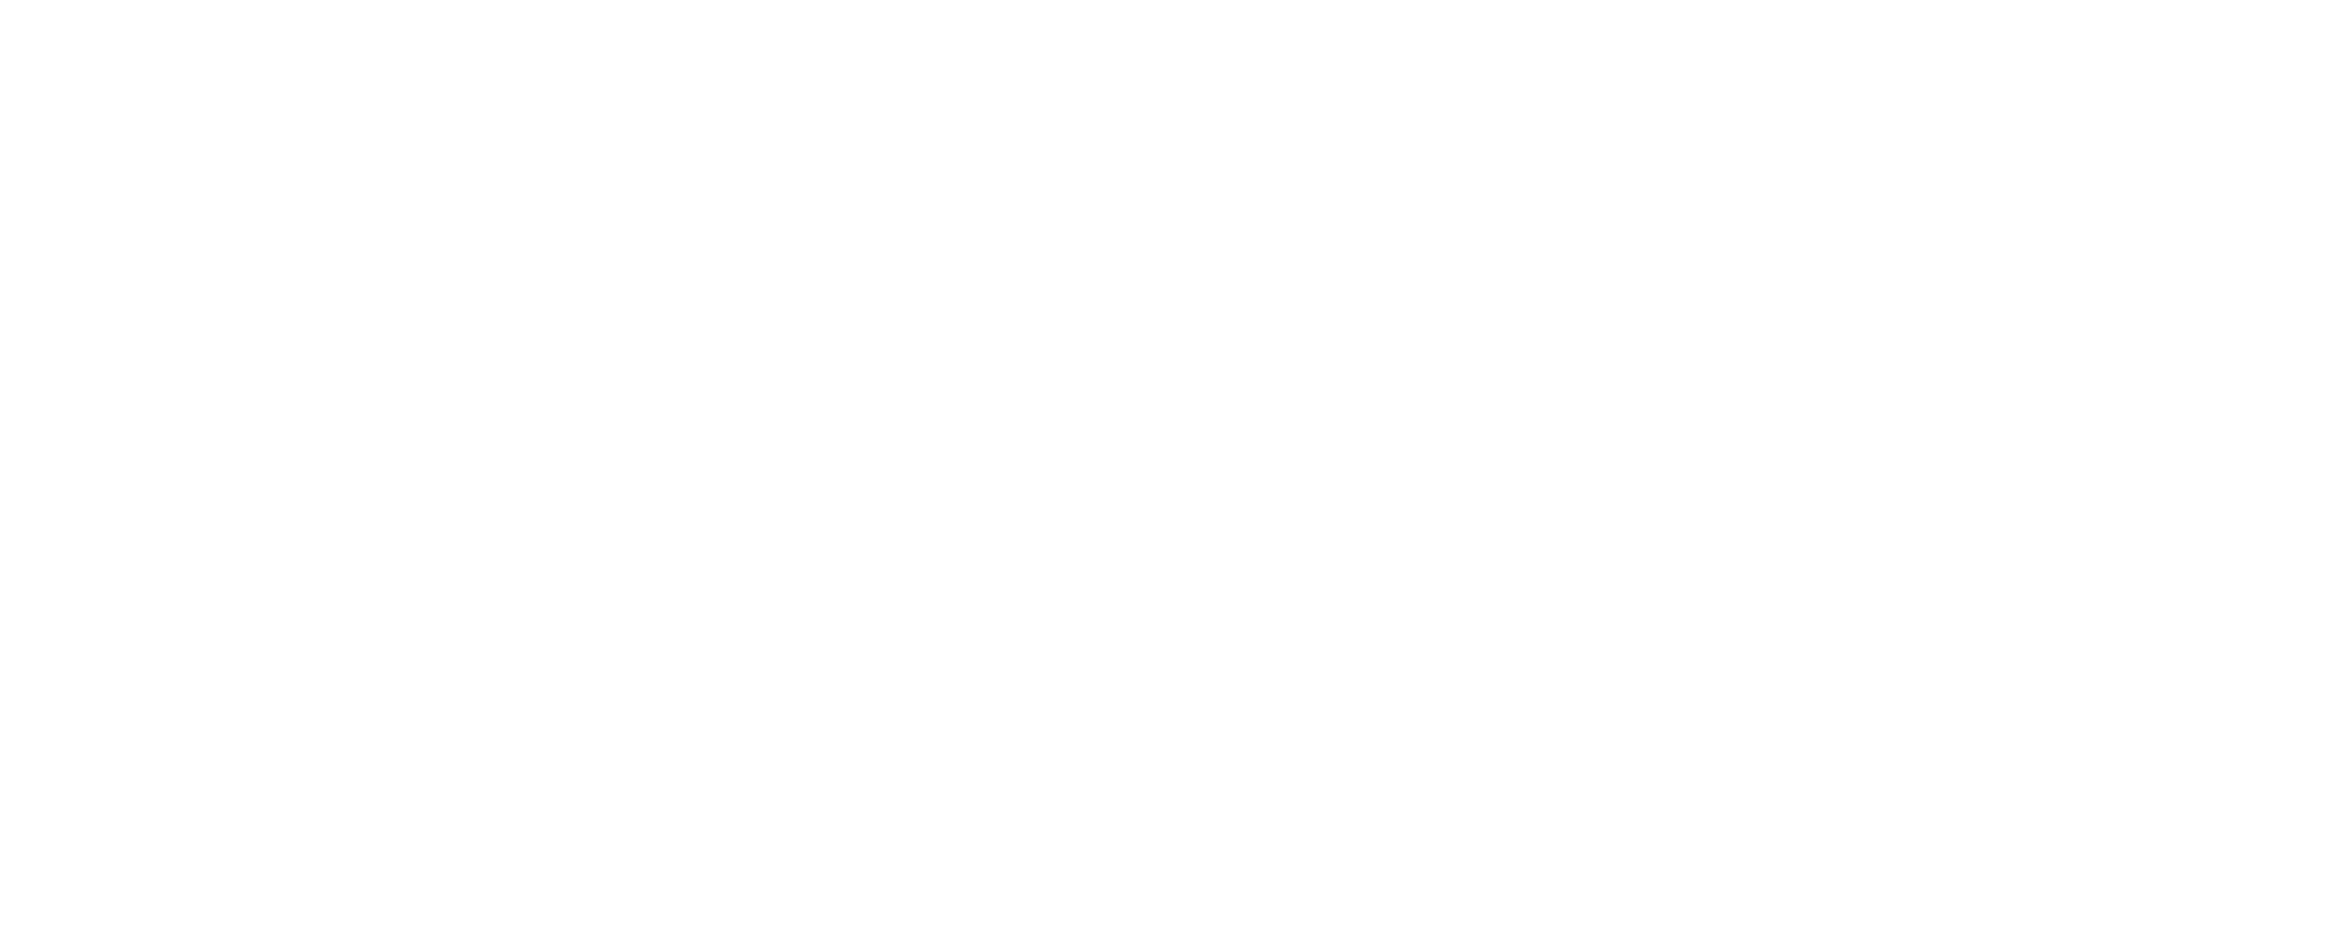 JazBah® The DNA of Music, Worldwide.